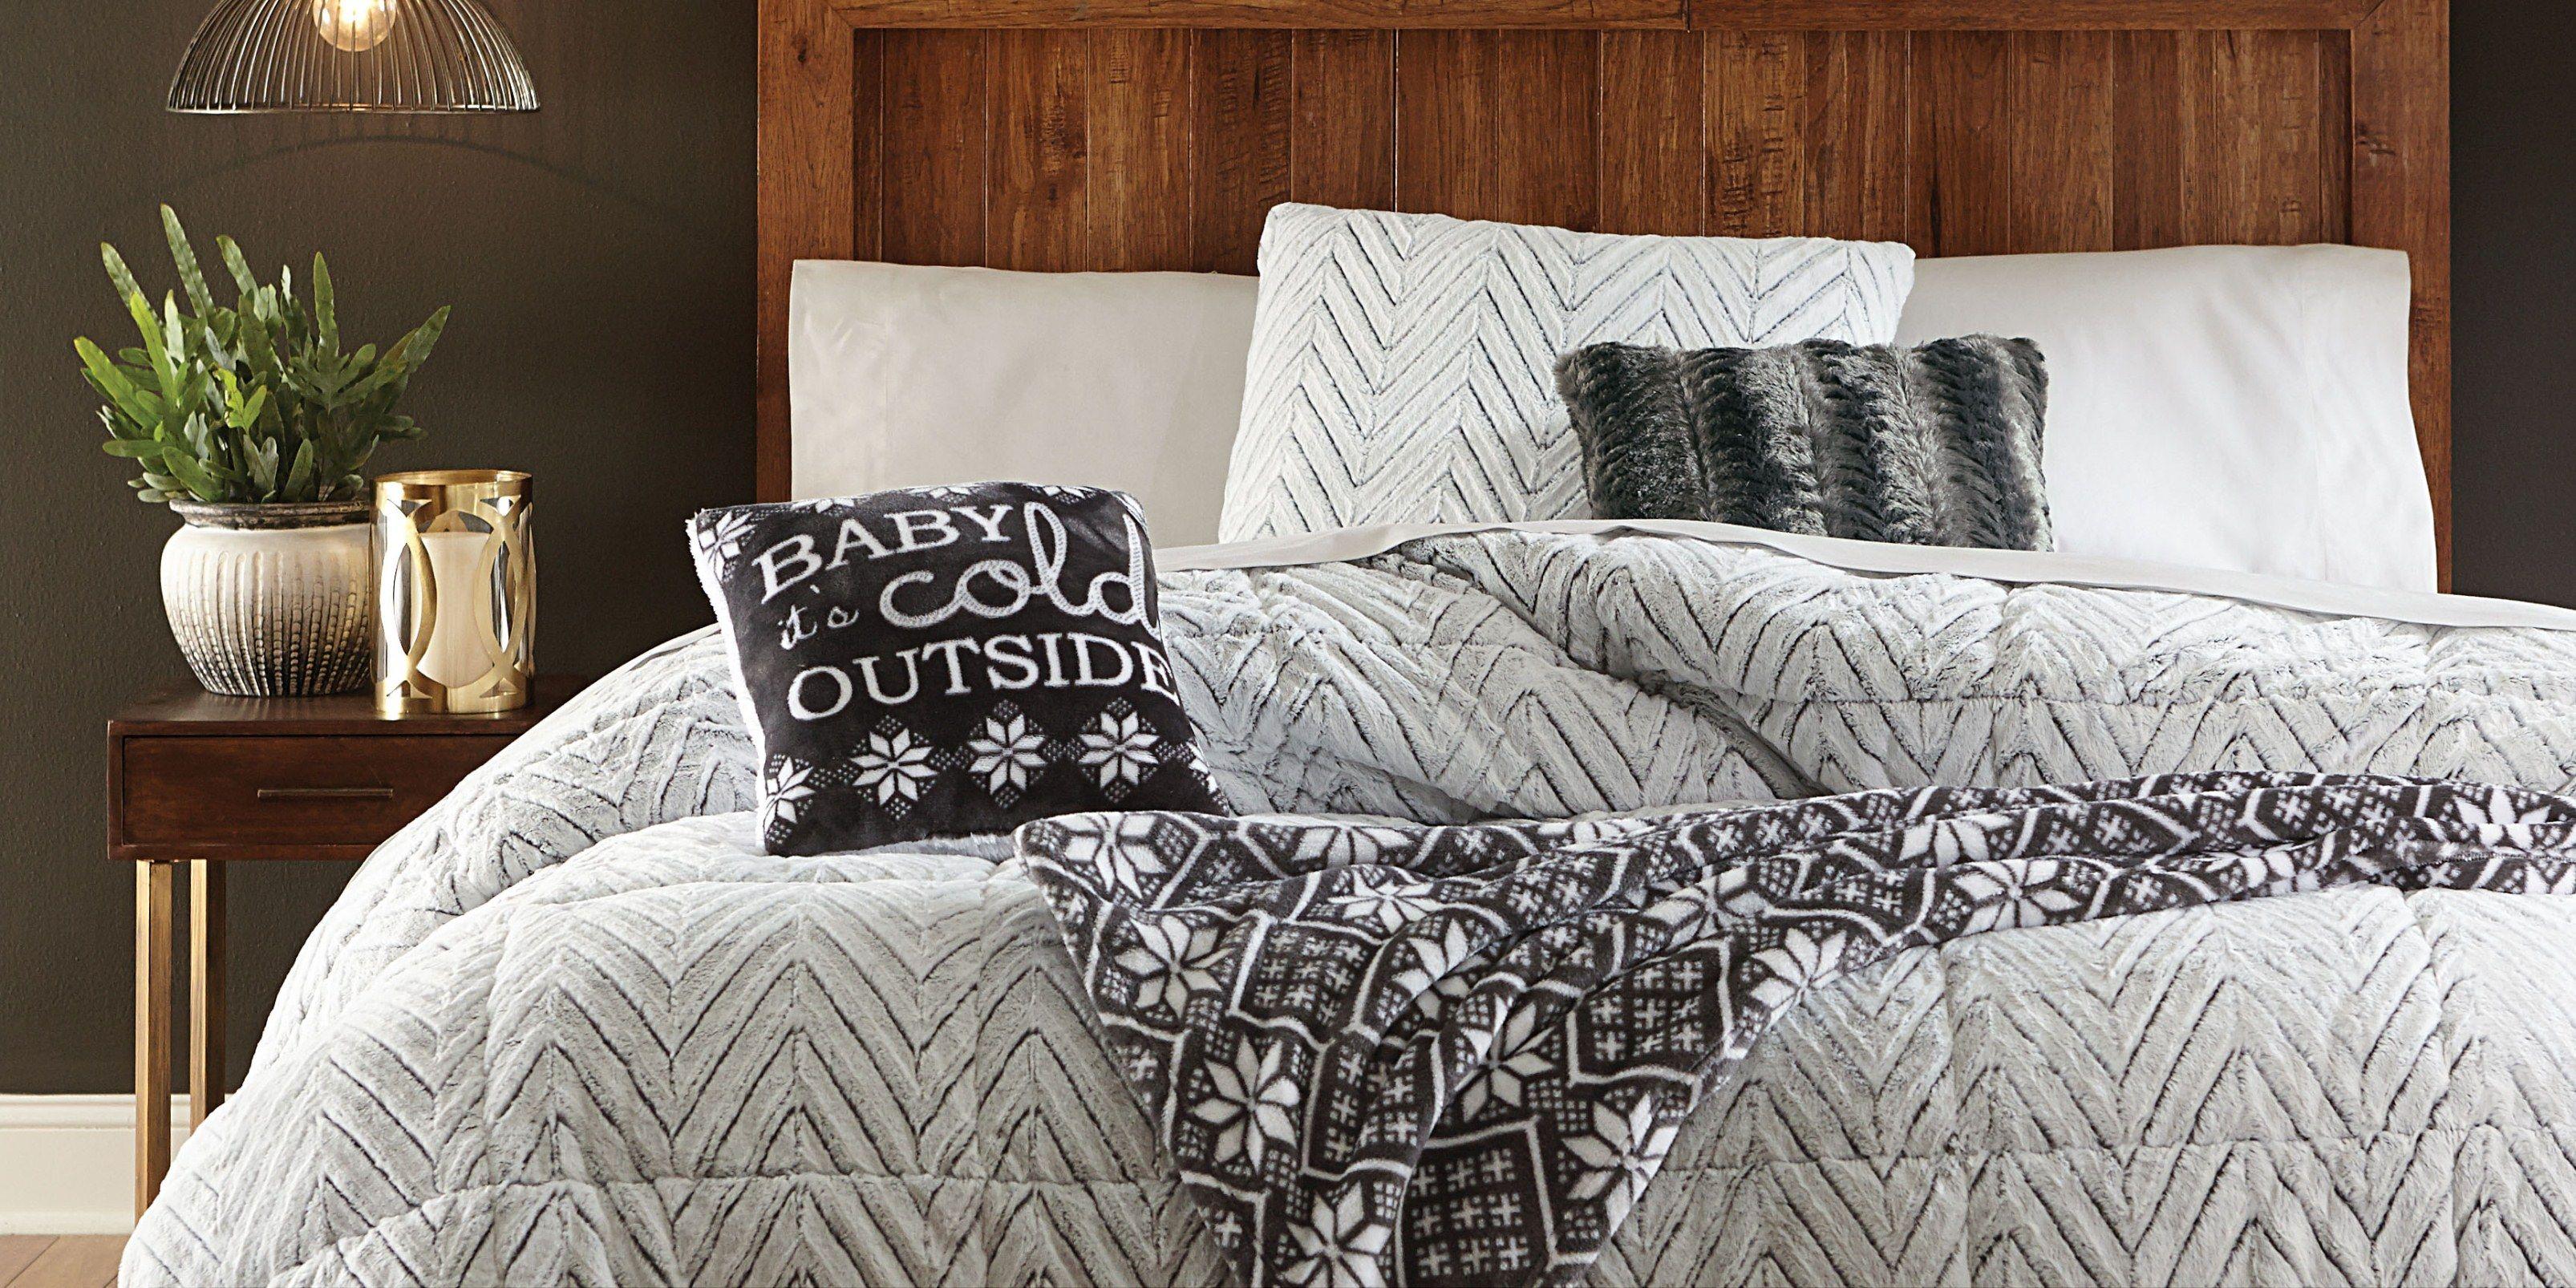 Full/Queen Faux Fur Comforter Chevron 45 OFF Fur